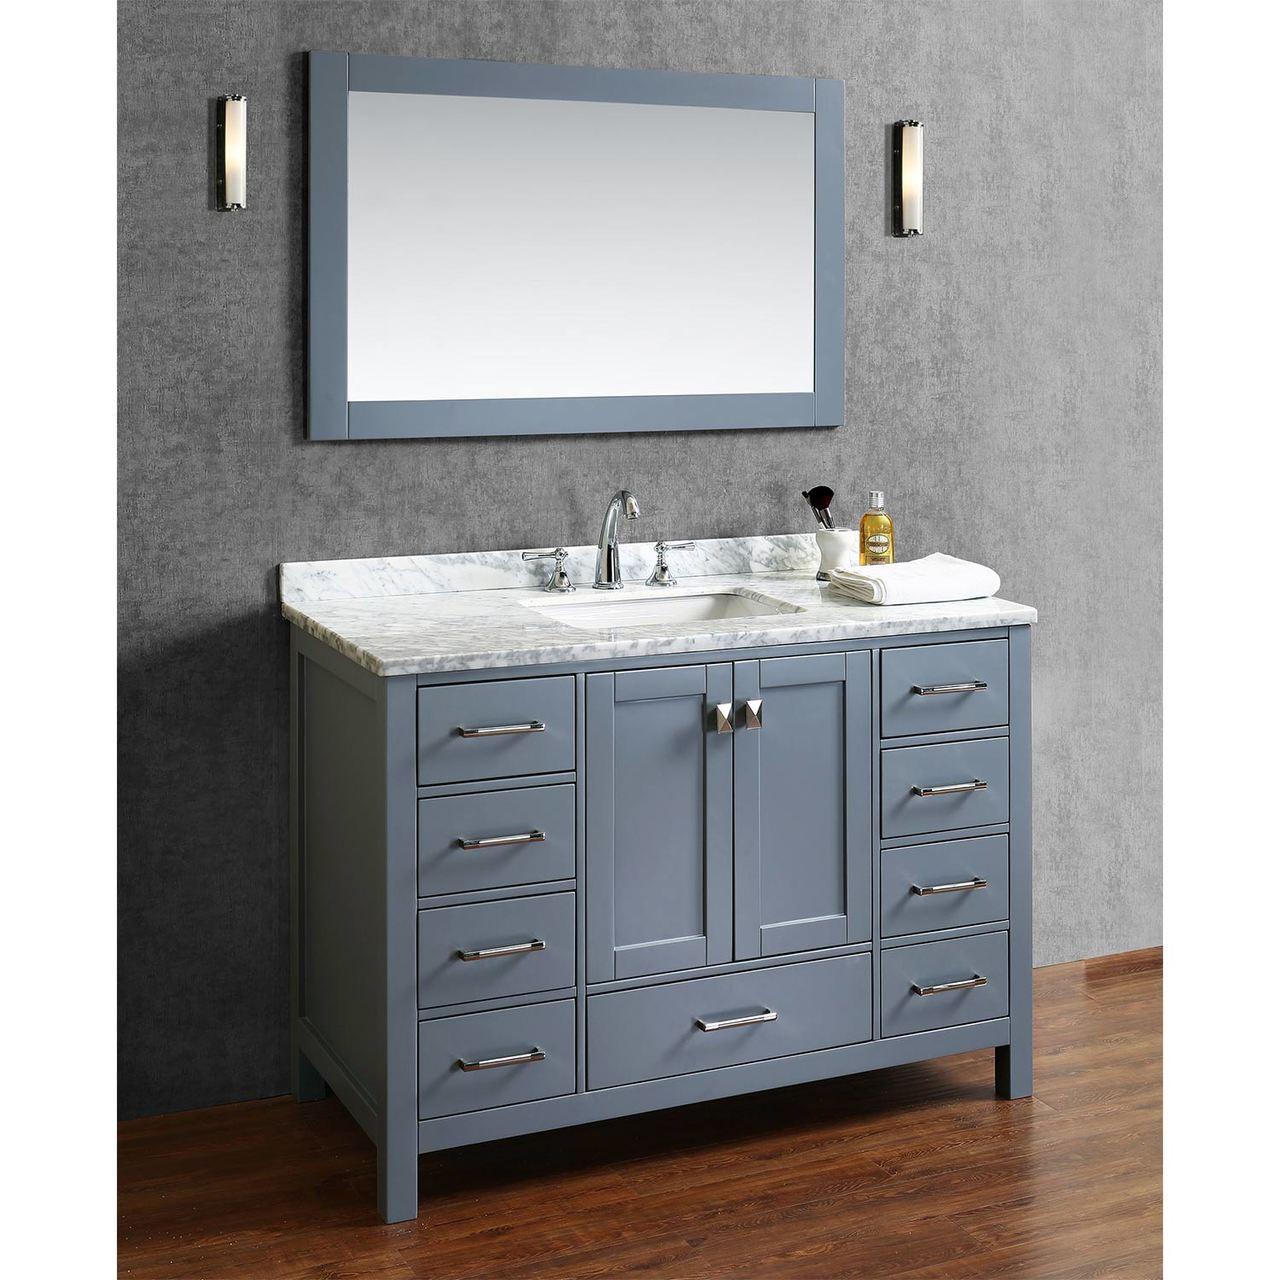 Royal Key West Collection 48 Inch Gray Bathroom Vanity